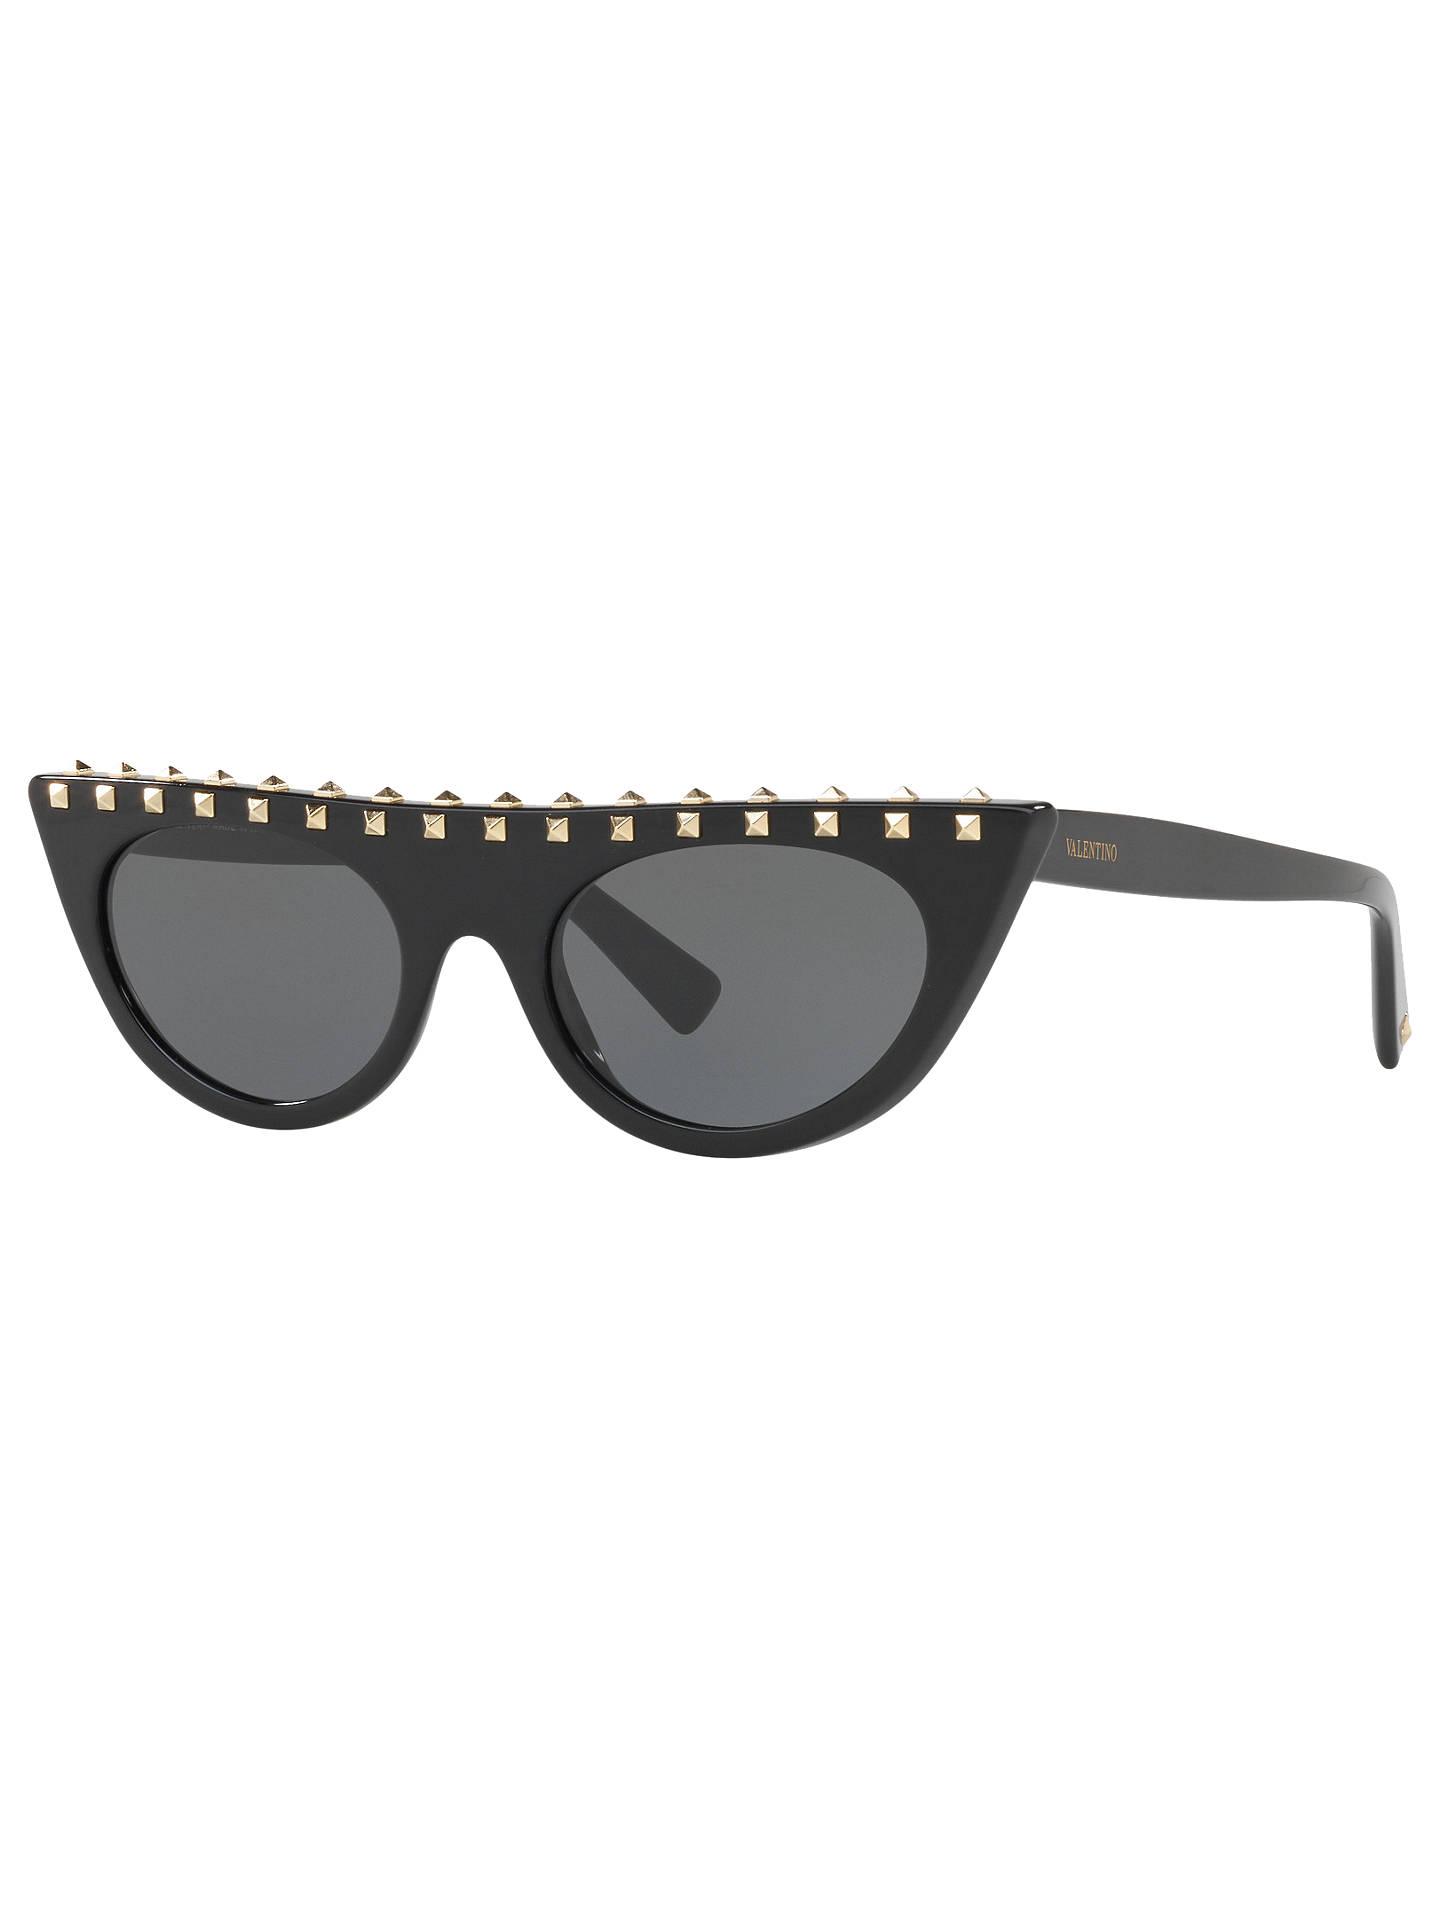 41a07c44e9857 Buy Valentino VA4018 Studded Cat s Eye Sunglasses